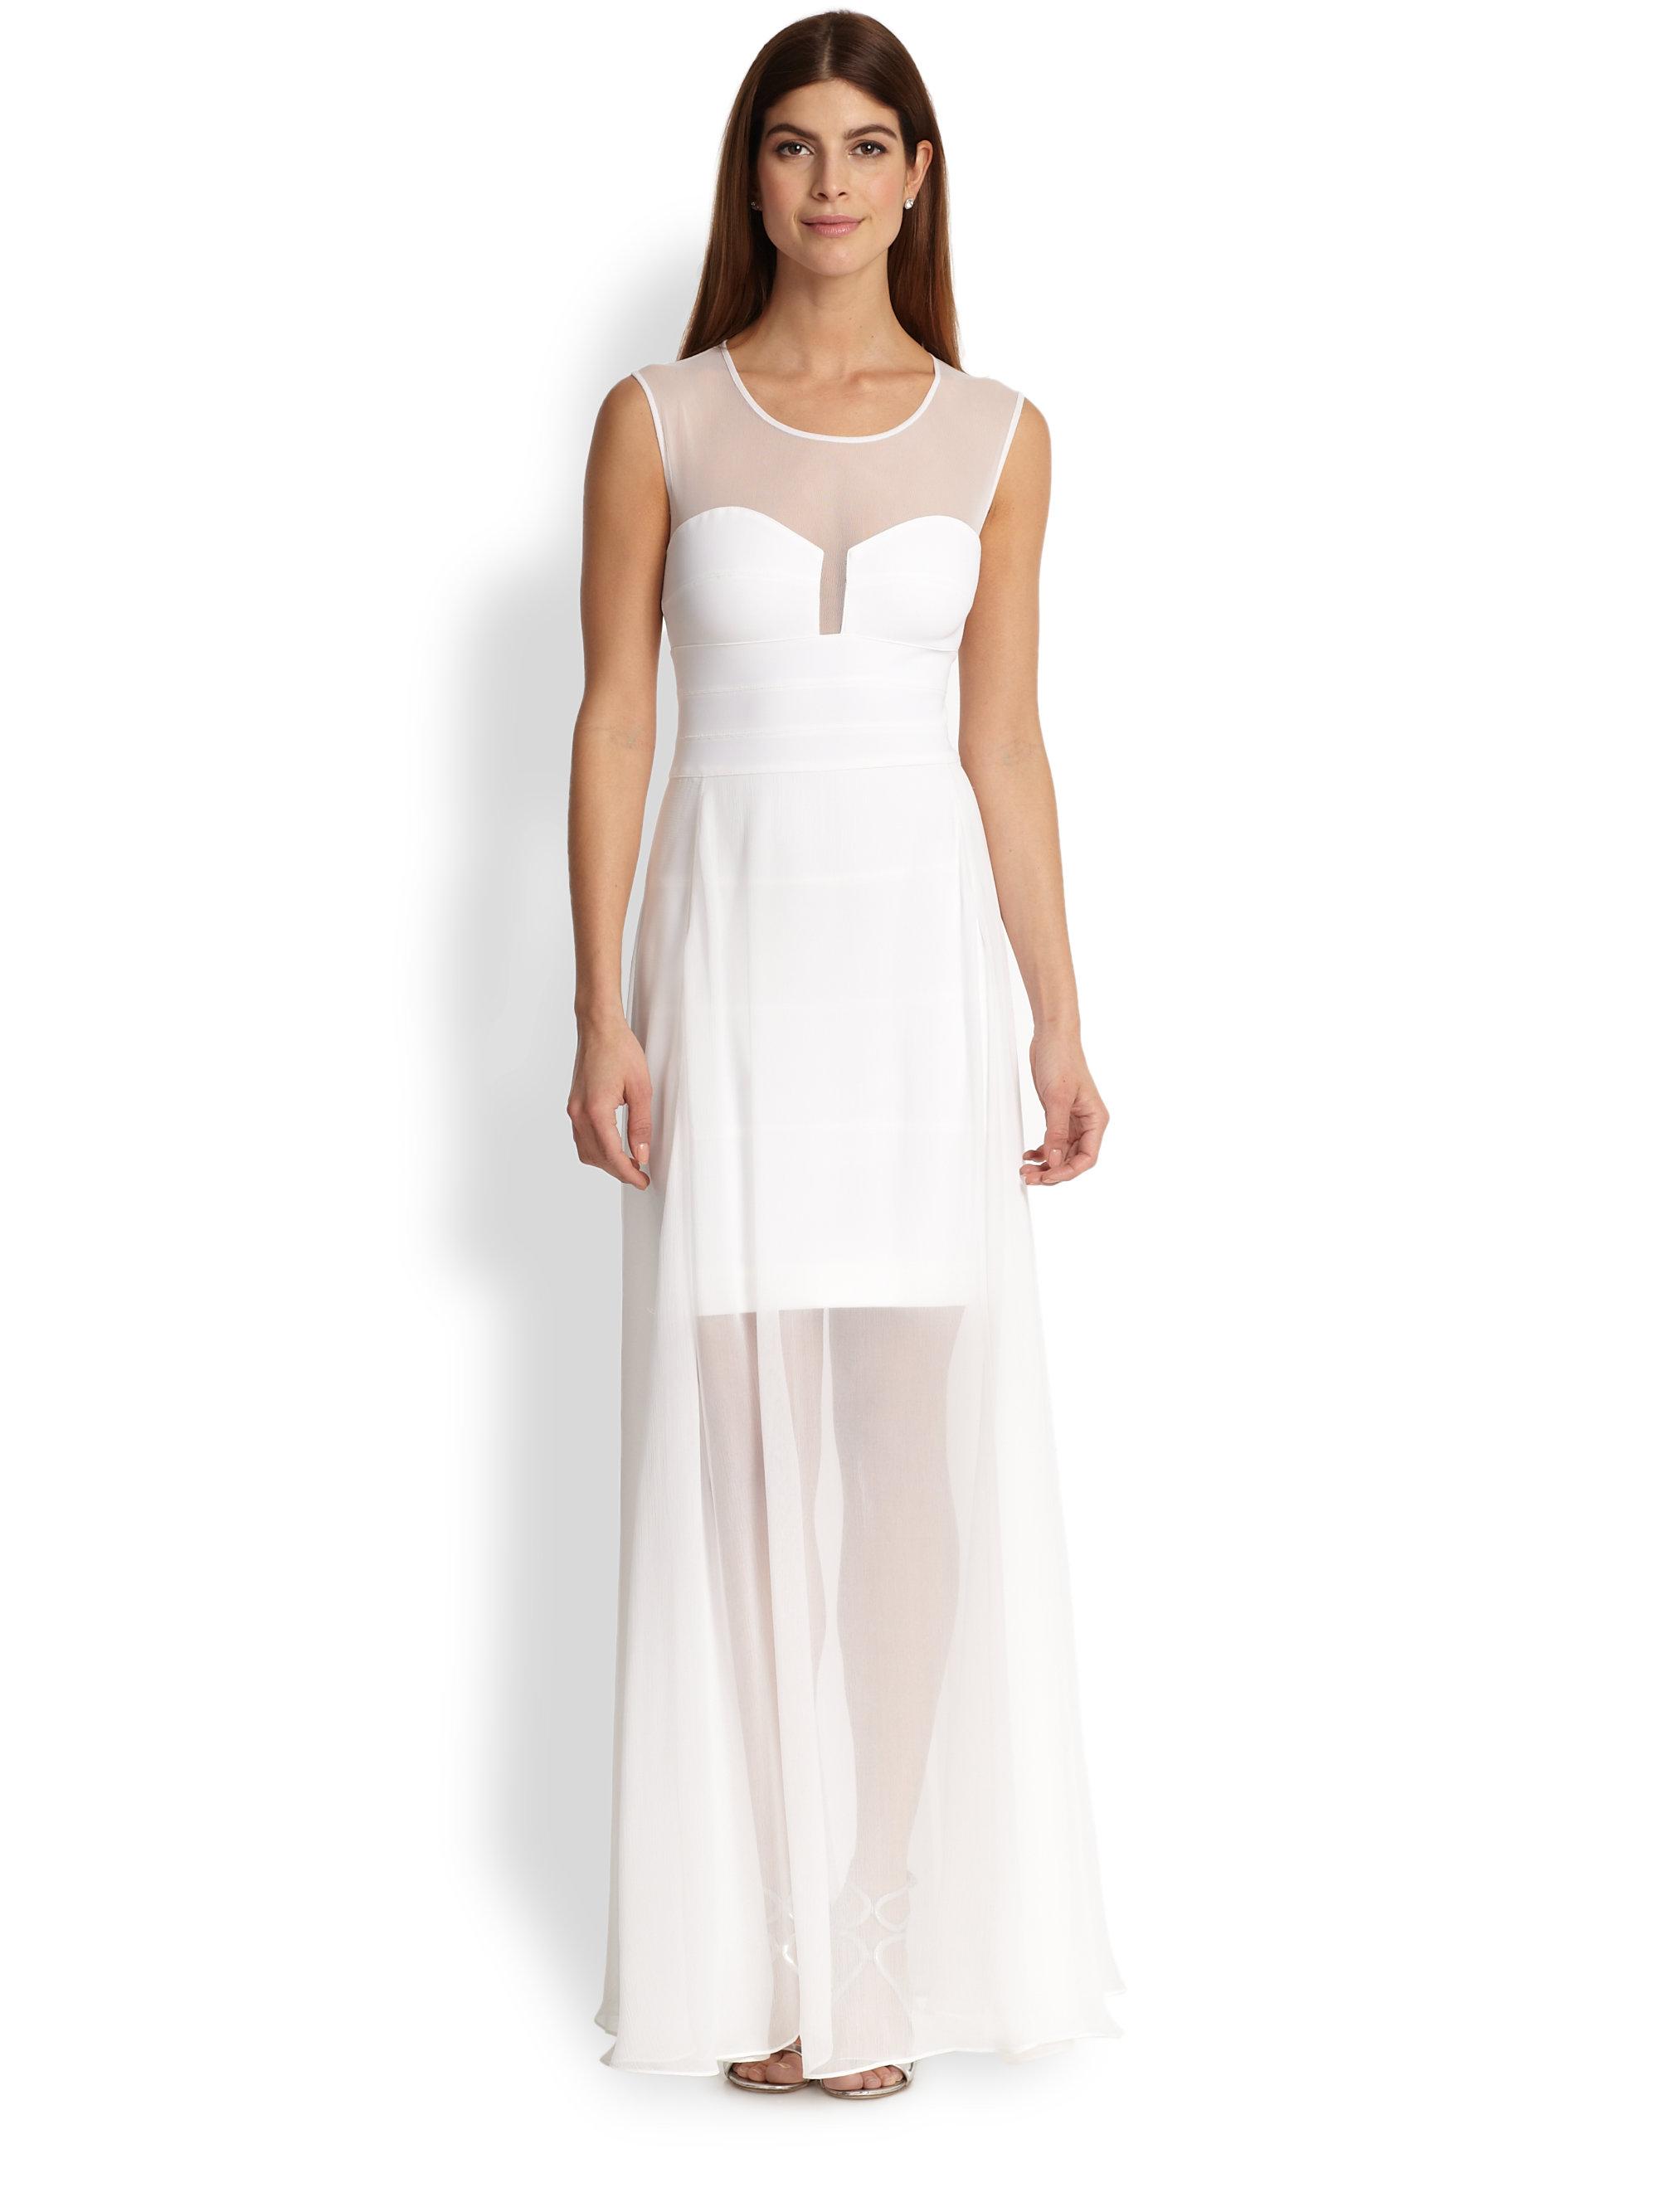 Lyst - Bcbgmaxazria Alai Chiffon Overaly Gown in White